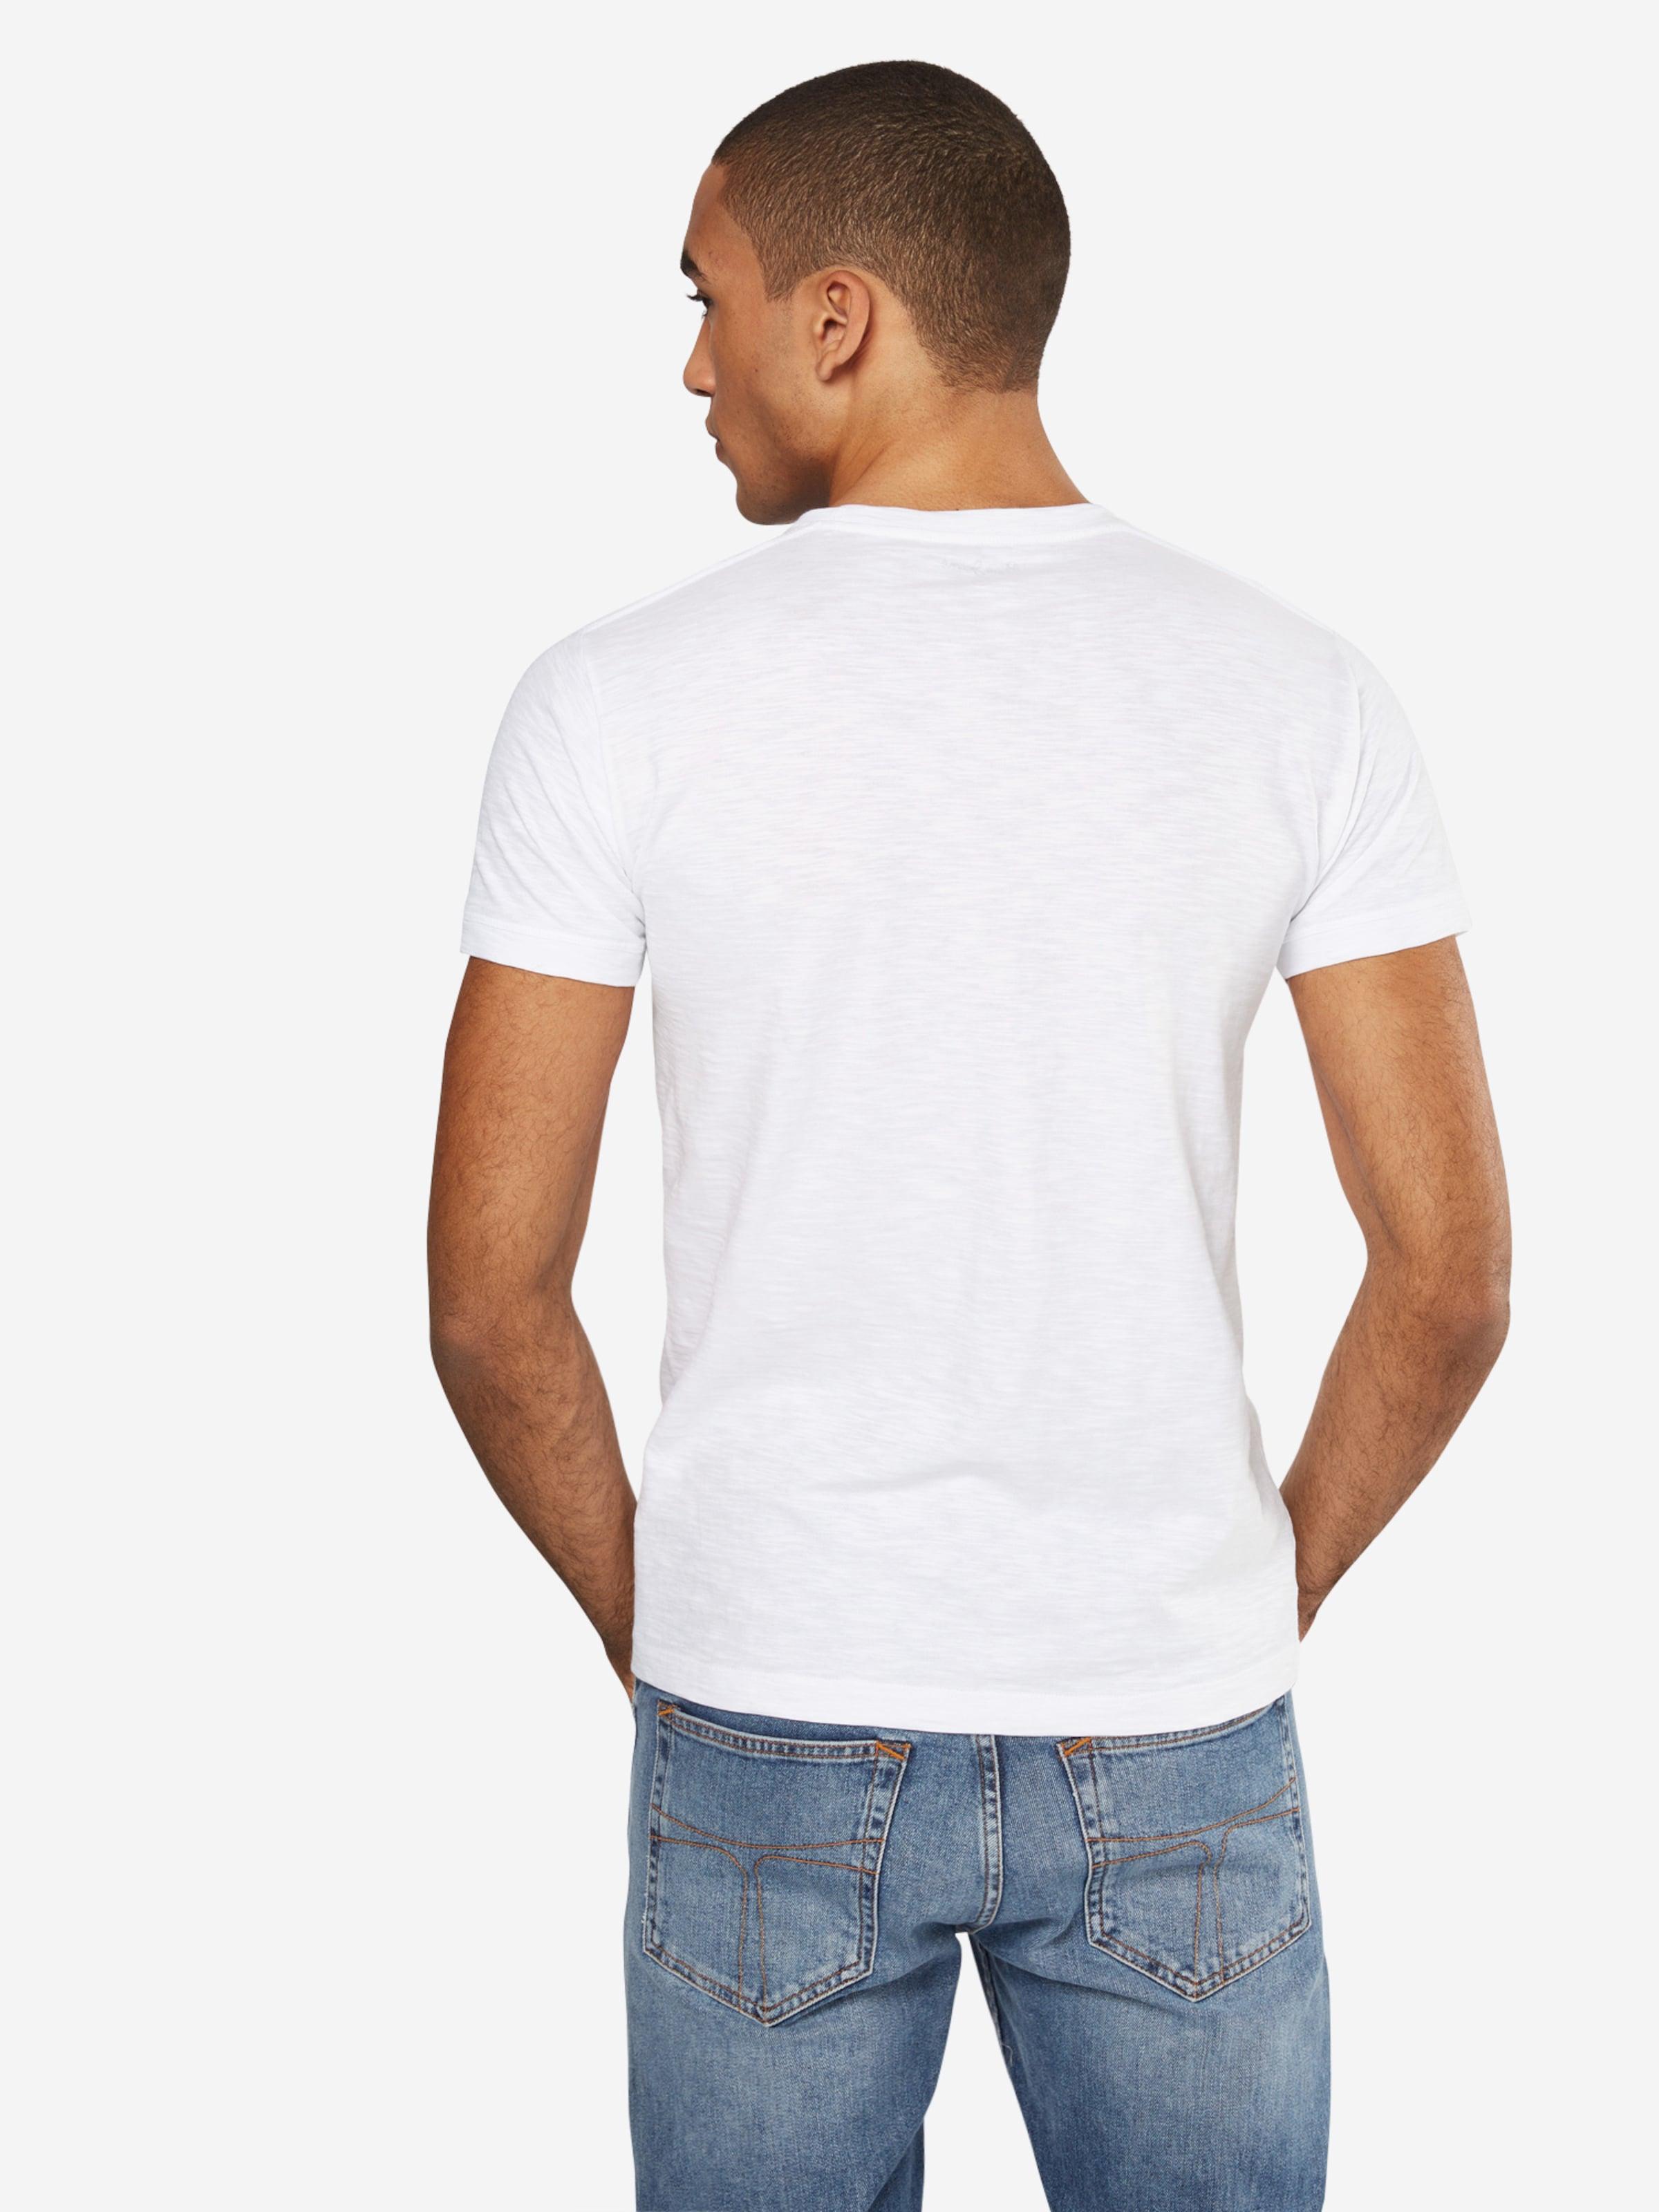 'amersham' Shirt Wit Pepe GeelZwart Jeans In tQCshrd